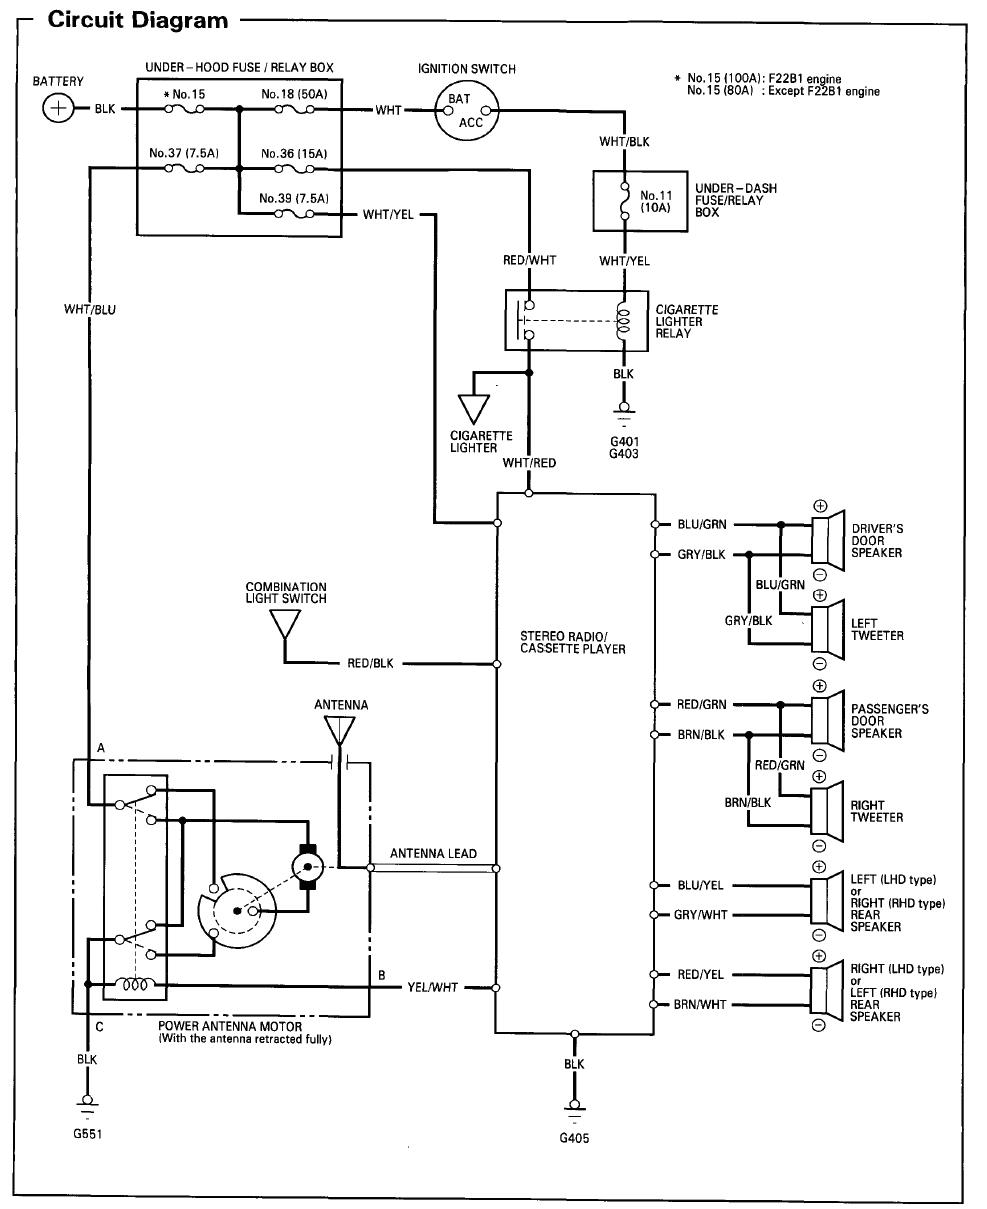 2002 honda accord wiring diagram wiring diagram rows 2002 honda accord wiring diagram